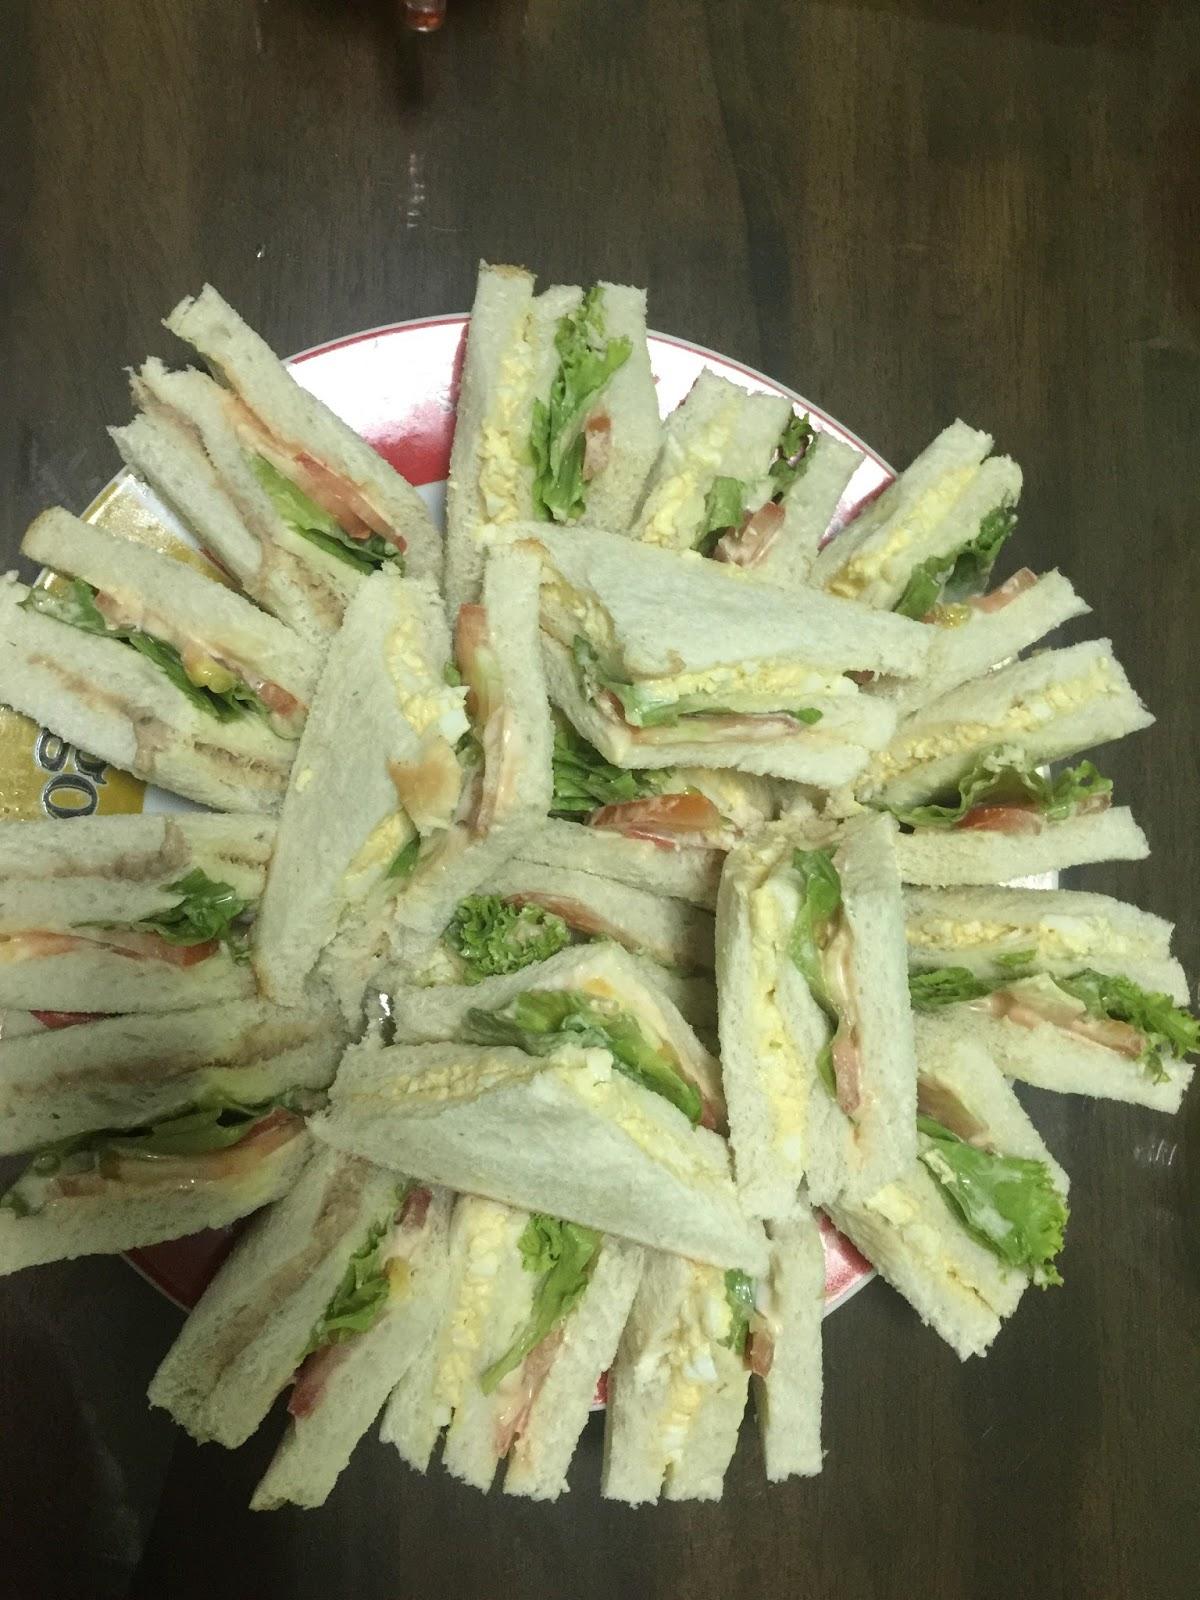 sandwich, resepi mudah sandwich, mudahnya menyediakan sandwich tuna, sandwich telur